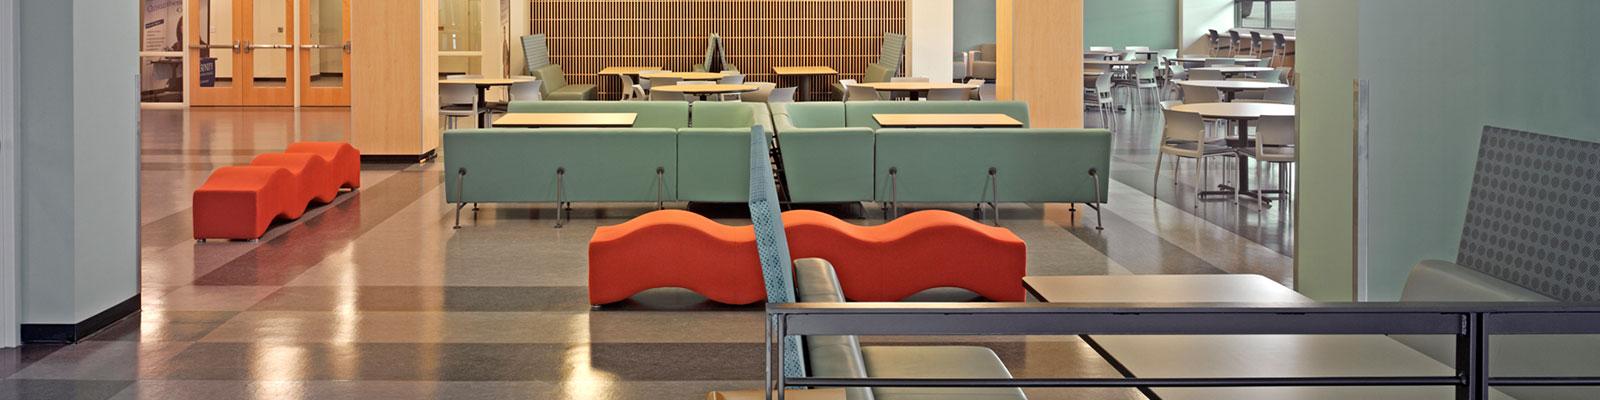 subcontractors kirtley cole associates. Black Bedroom Furniture Sets. Home Design Ideas